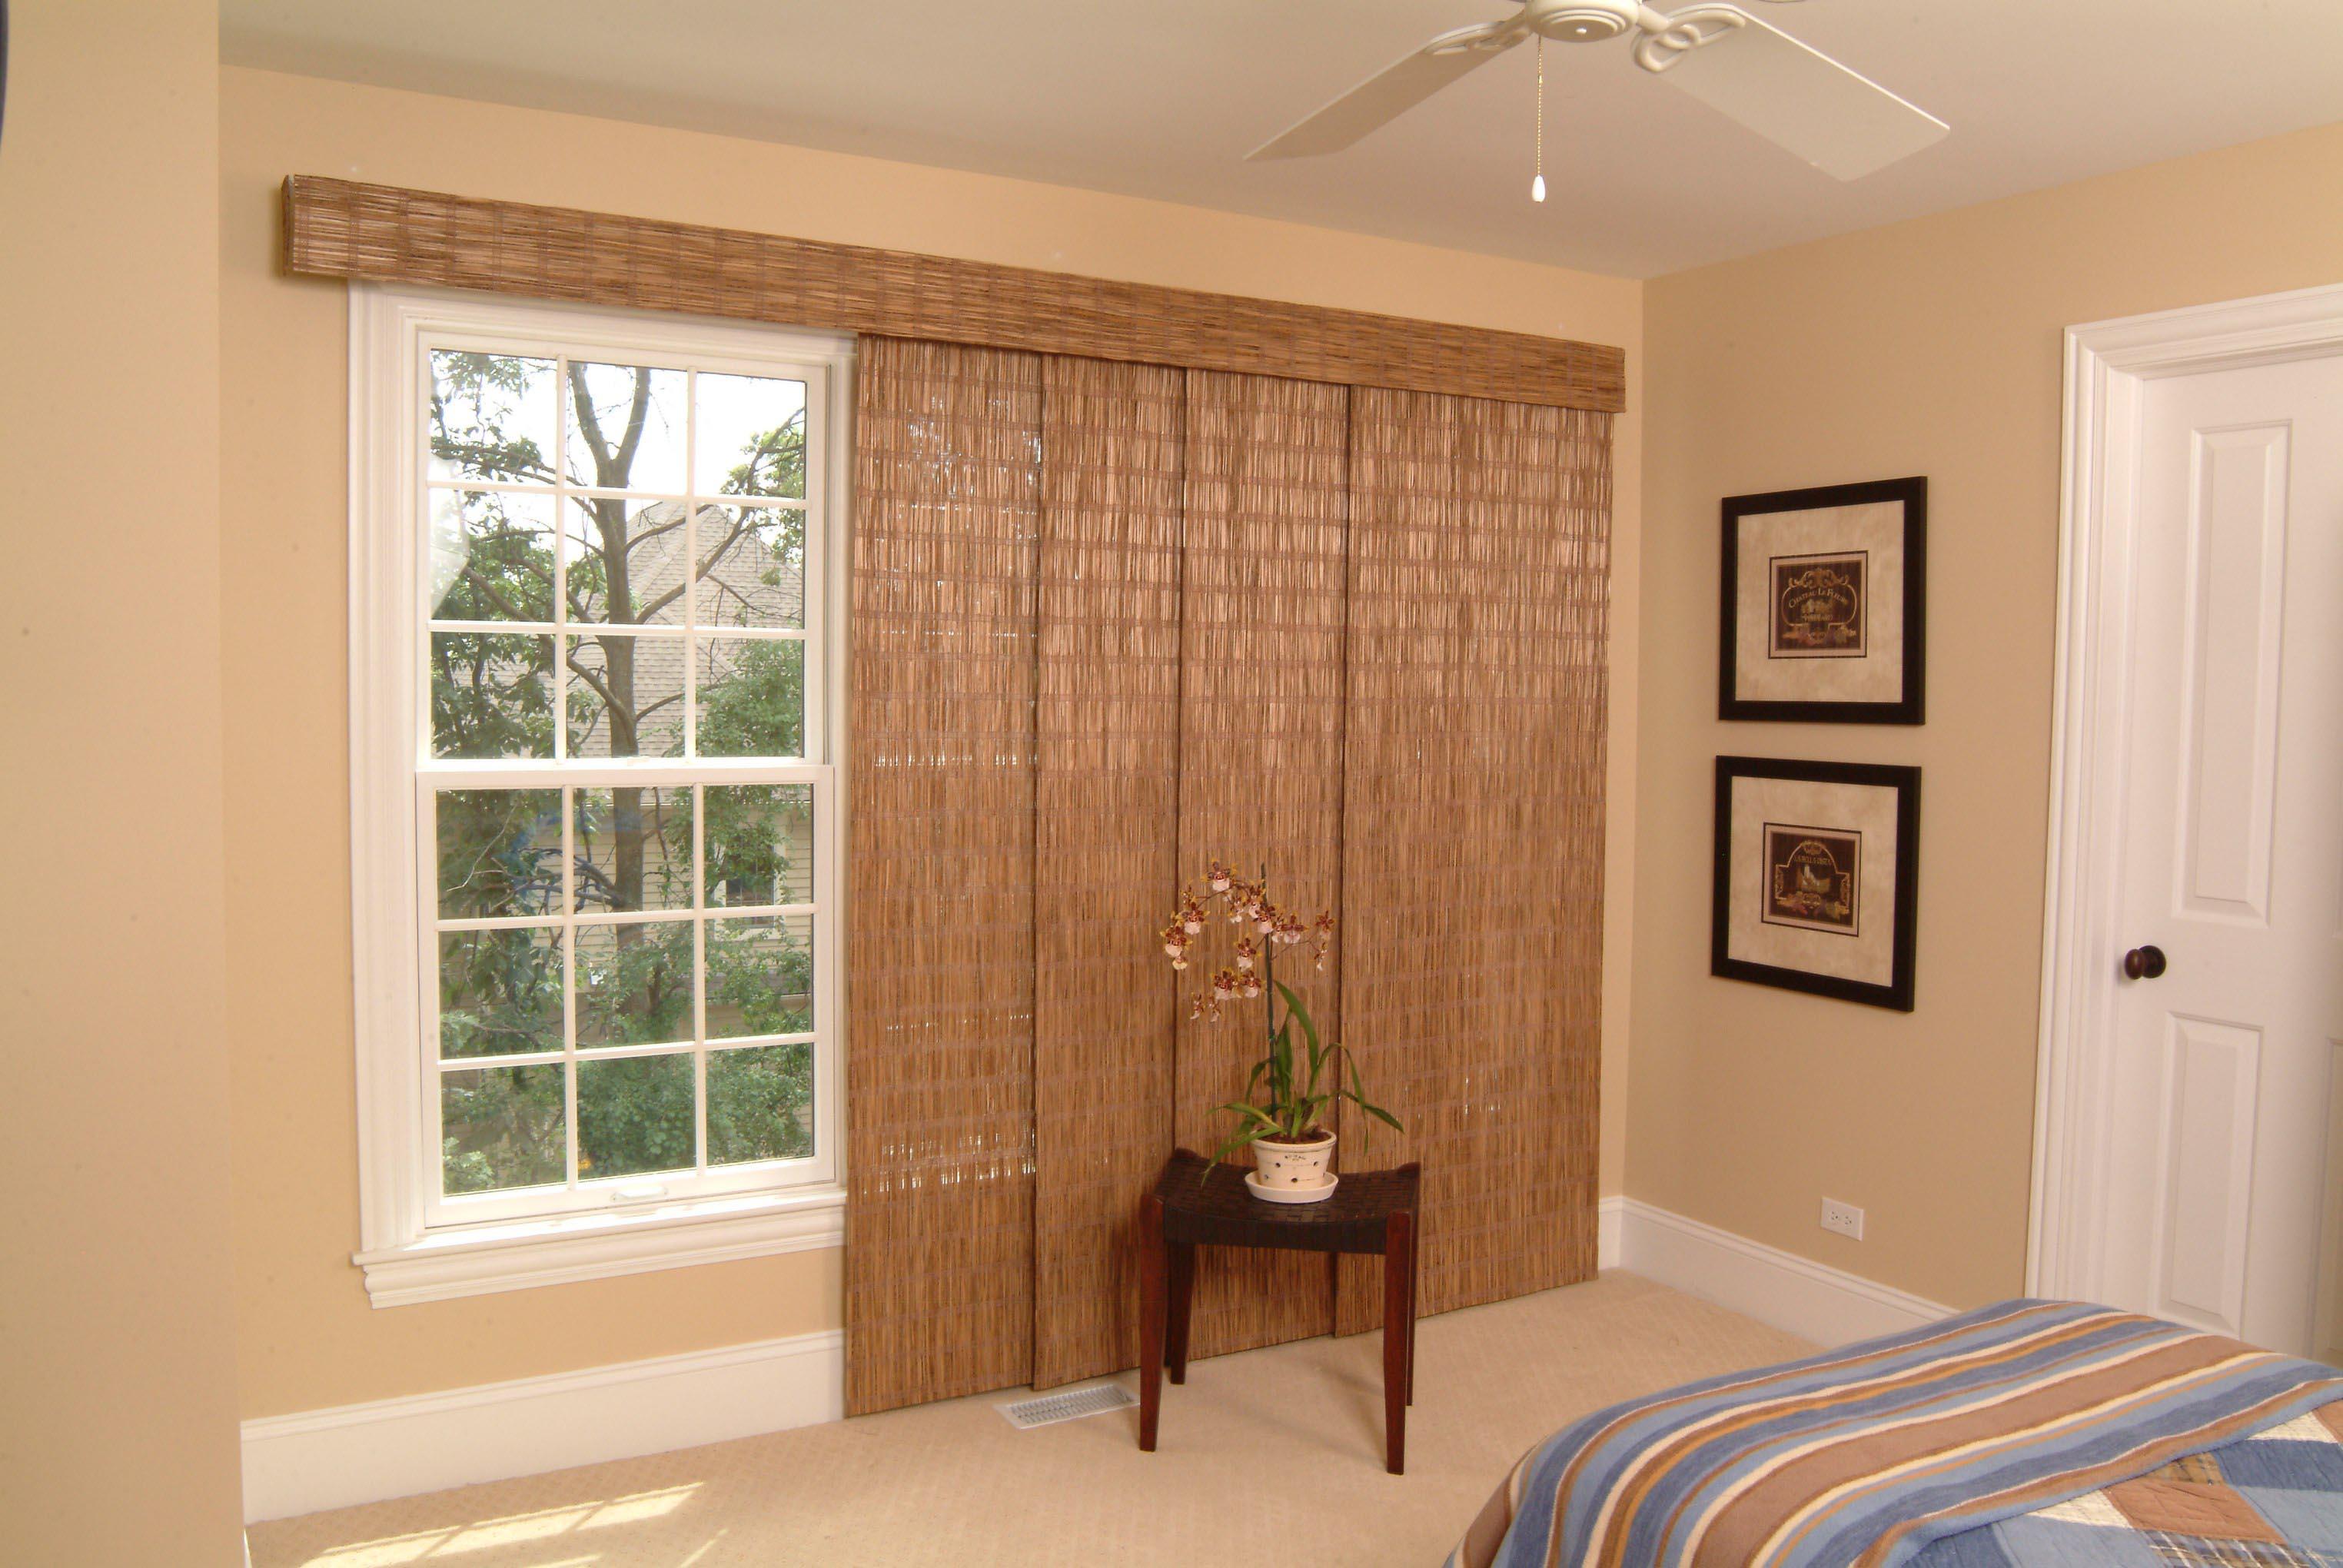 Beautiful Bedroom Screens Room Dividers Part 12 Beautiful Bedroom Screens Room Dividers Bedroom Screens